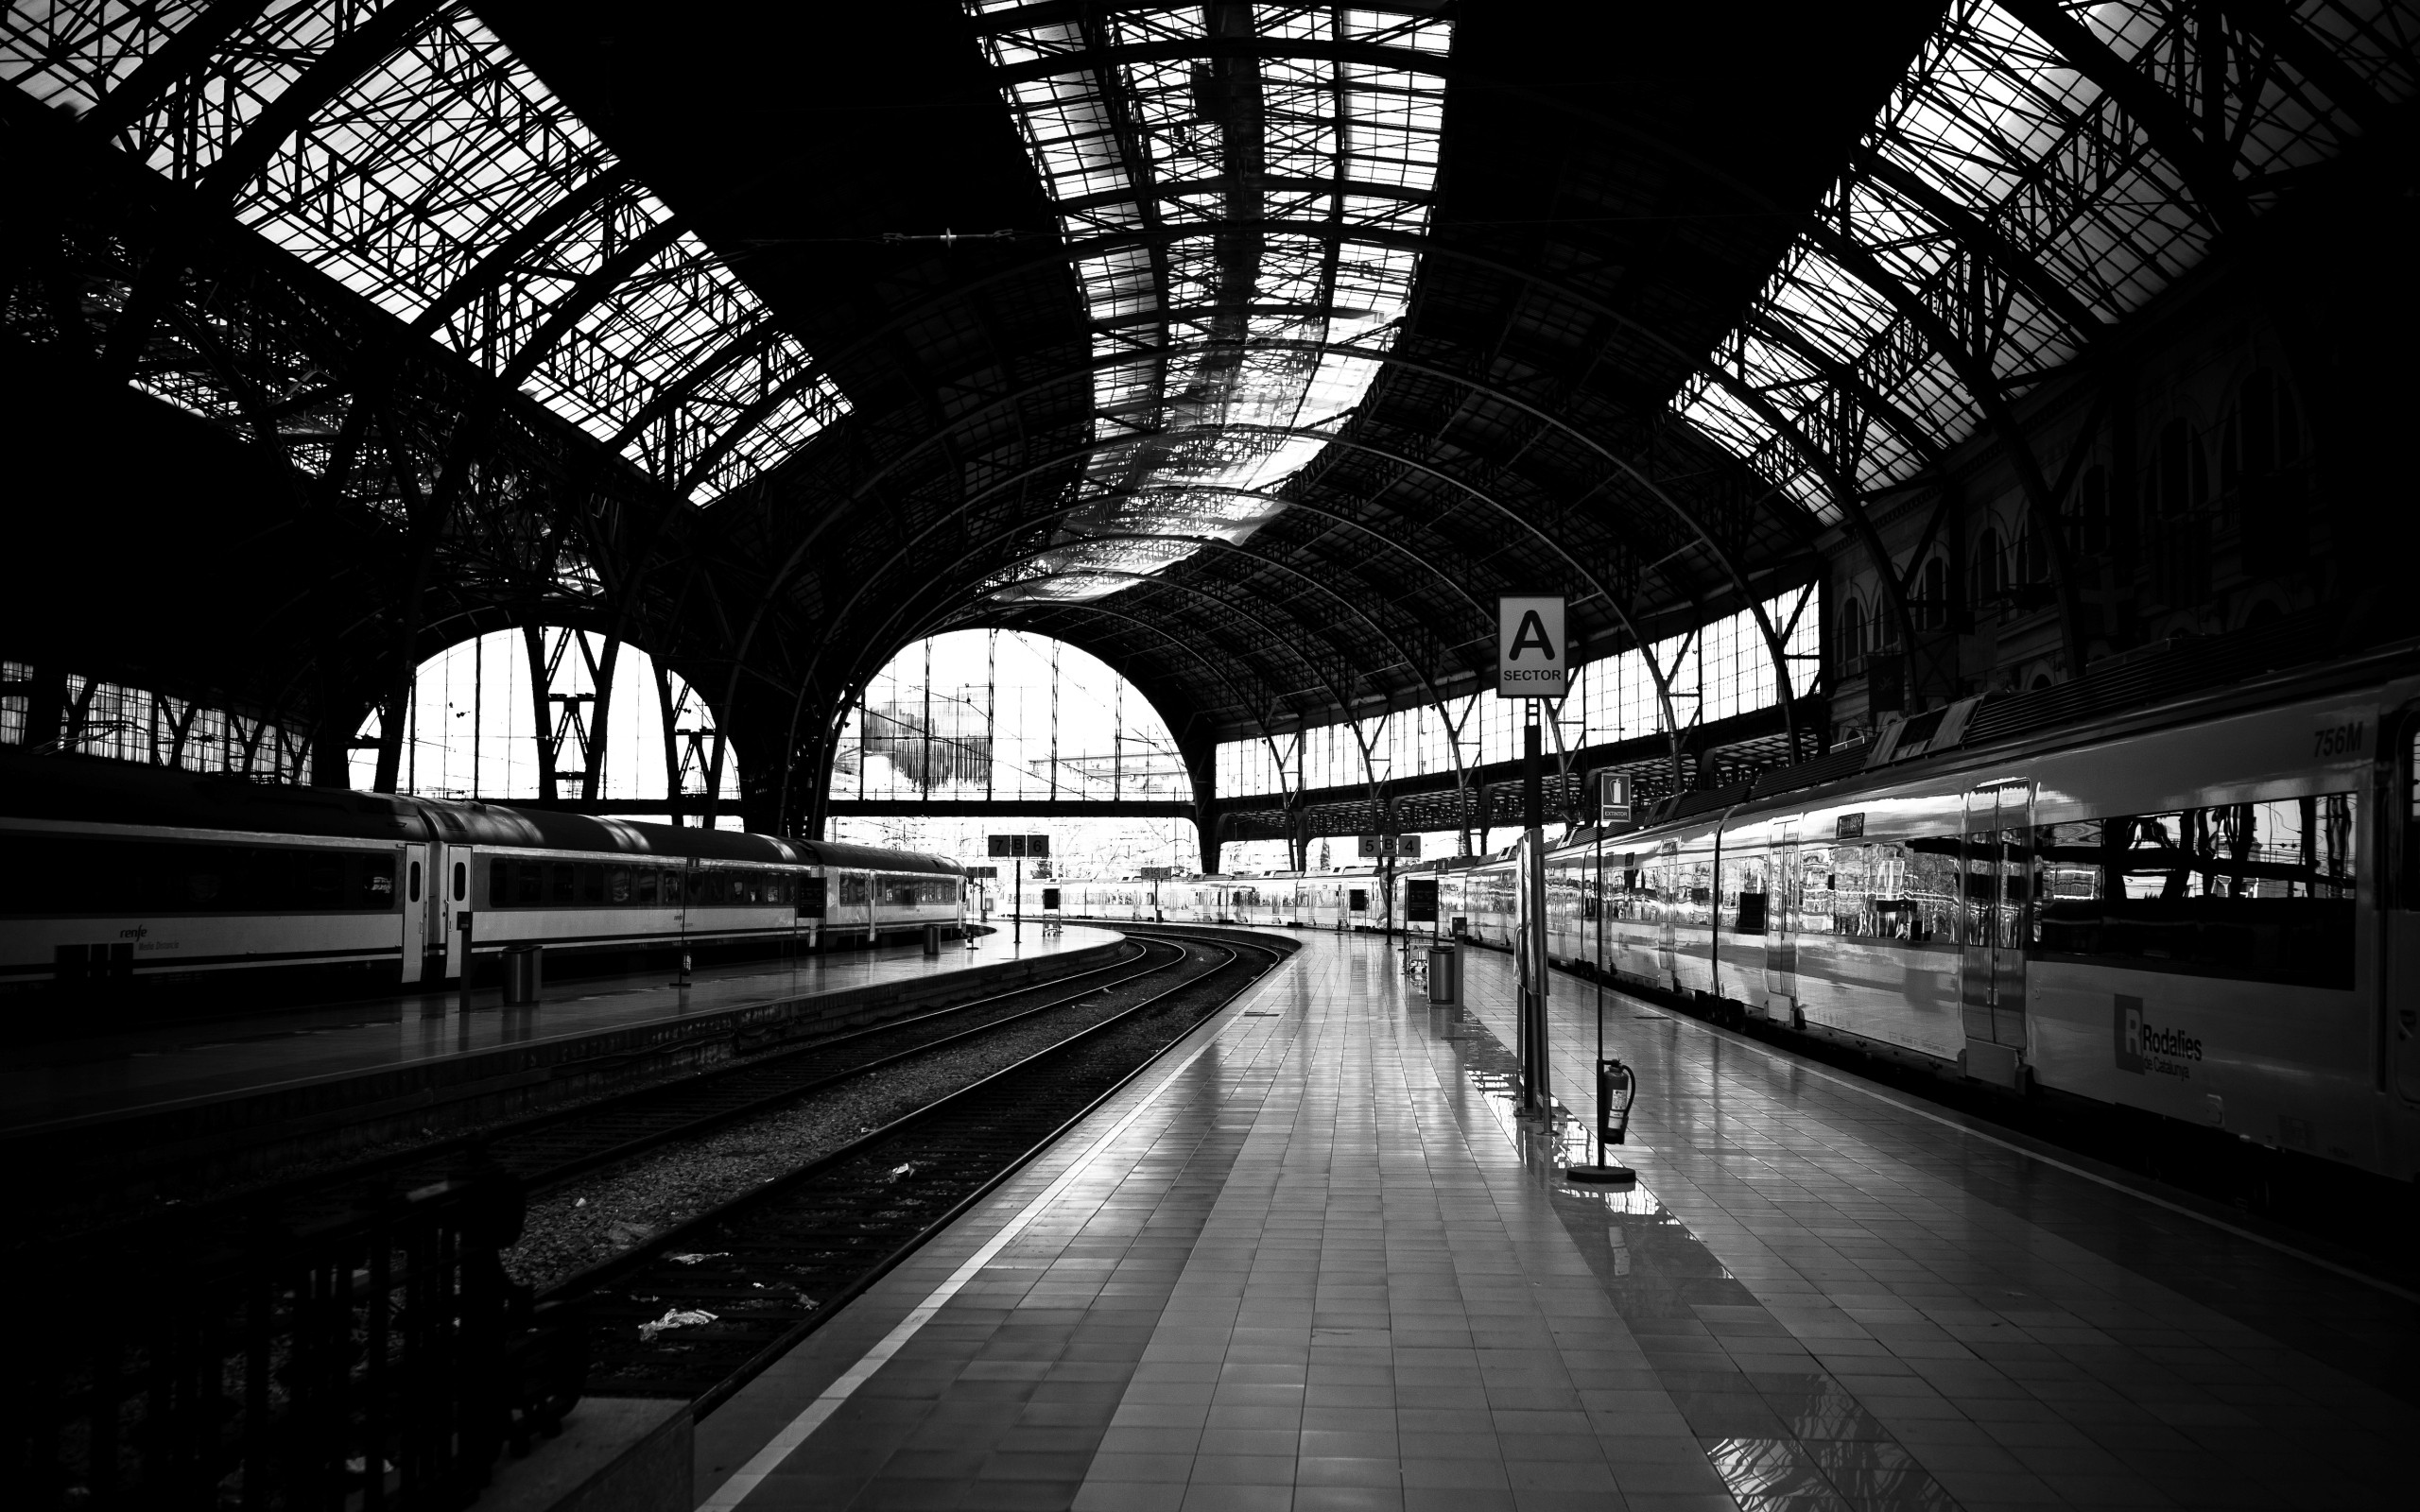 Train Station Wallpaper